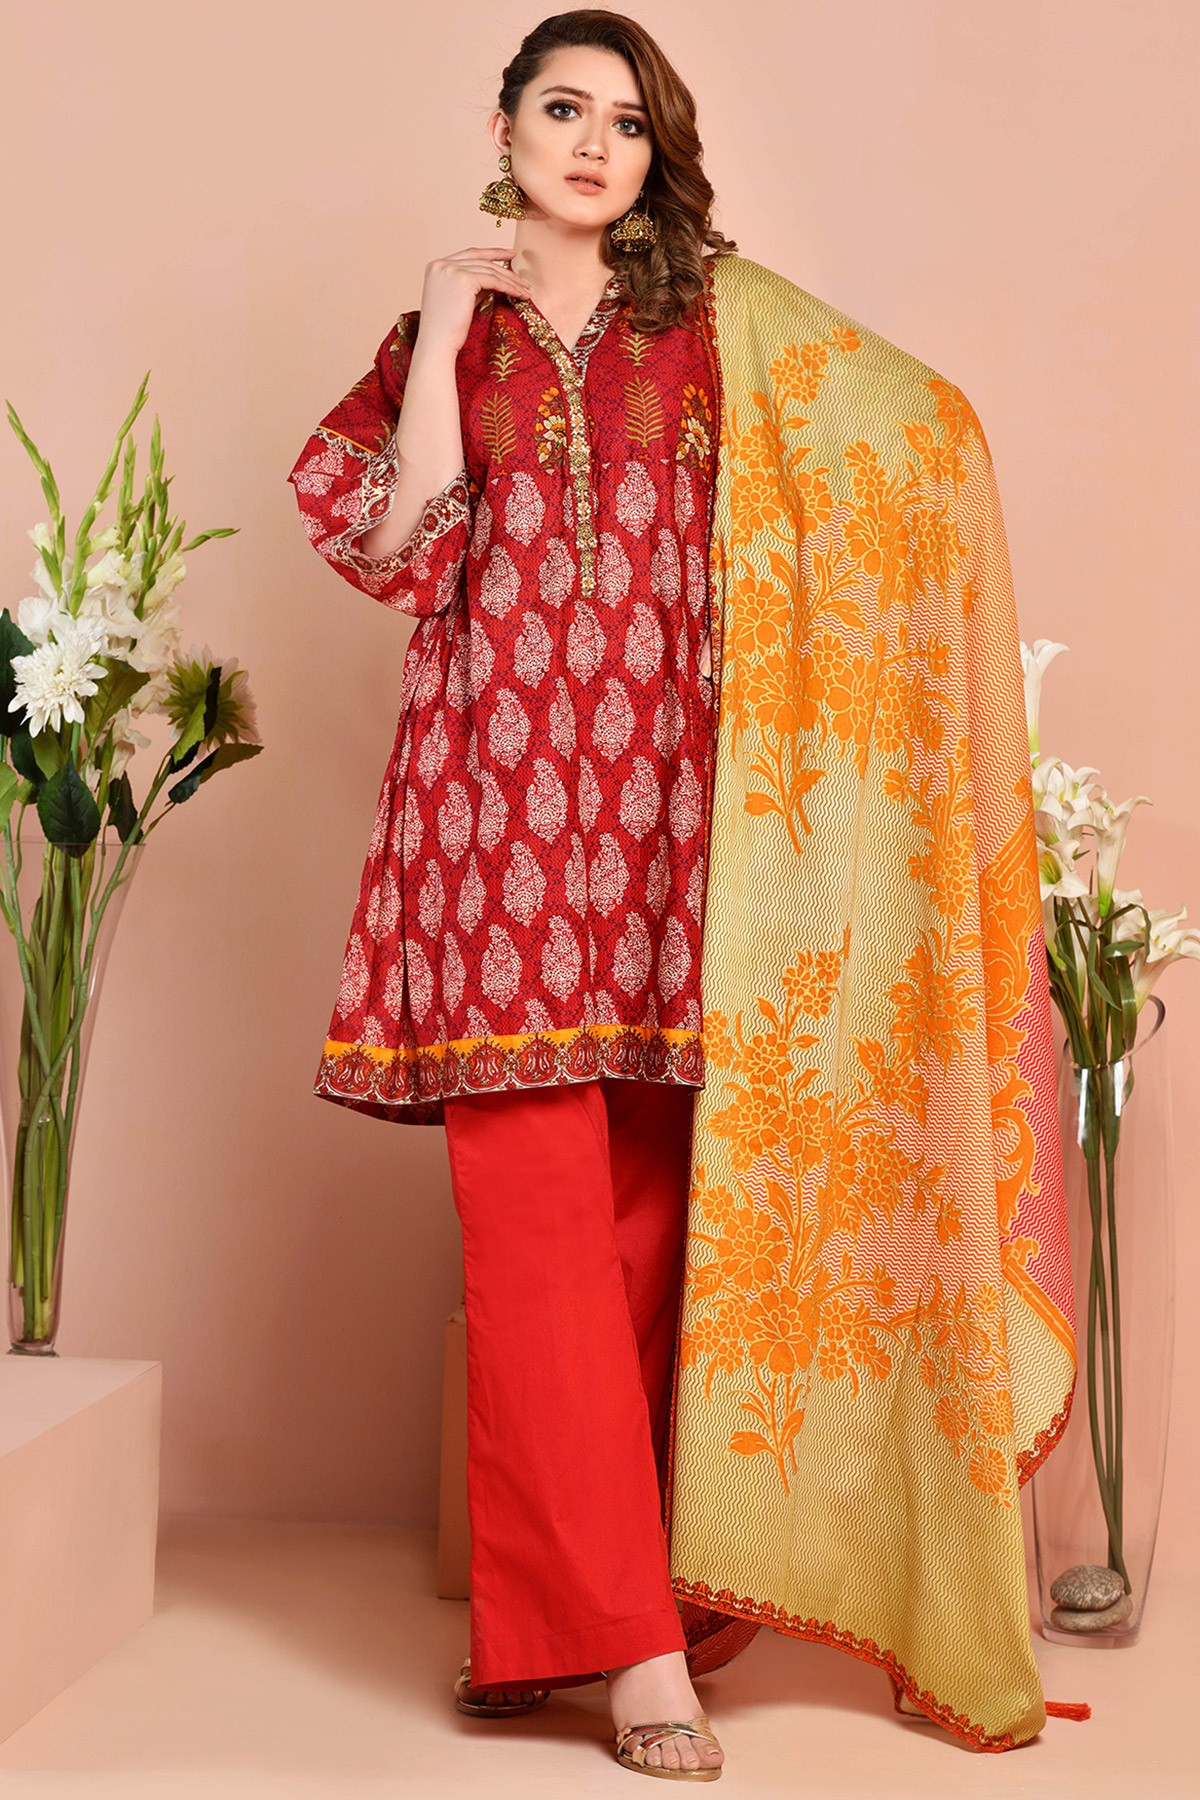 Kayseria Latest Winter Prints Best Shawls Dresses 2014: Kayseria Beautiful Fancy Eid Dresses Collection 2018-2019